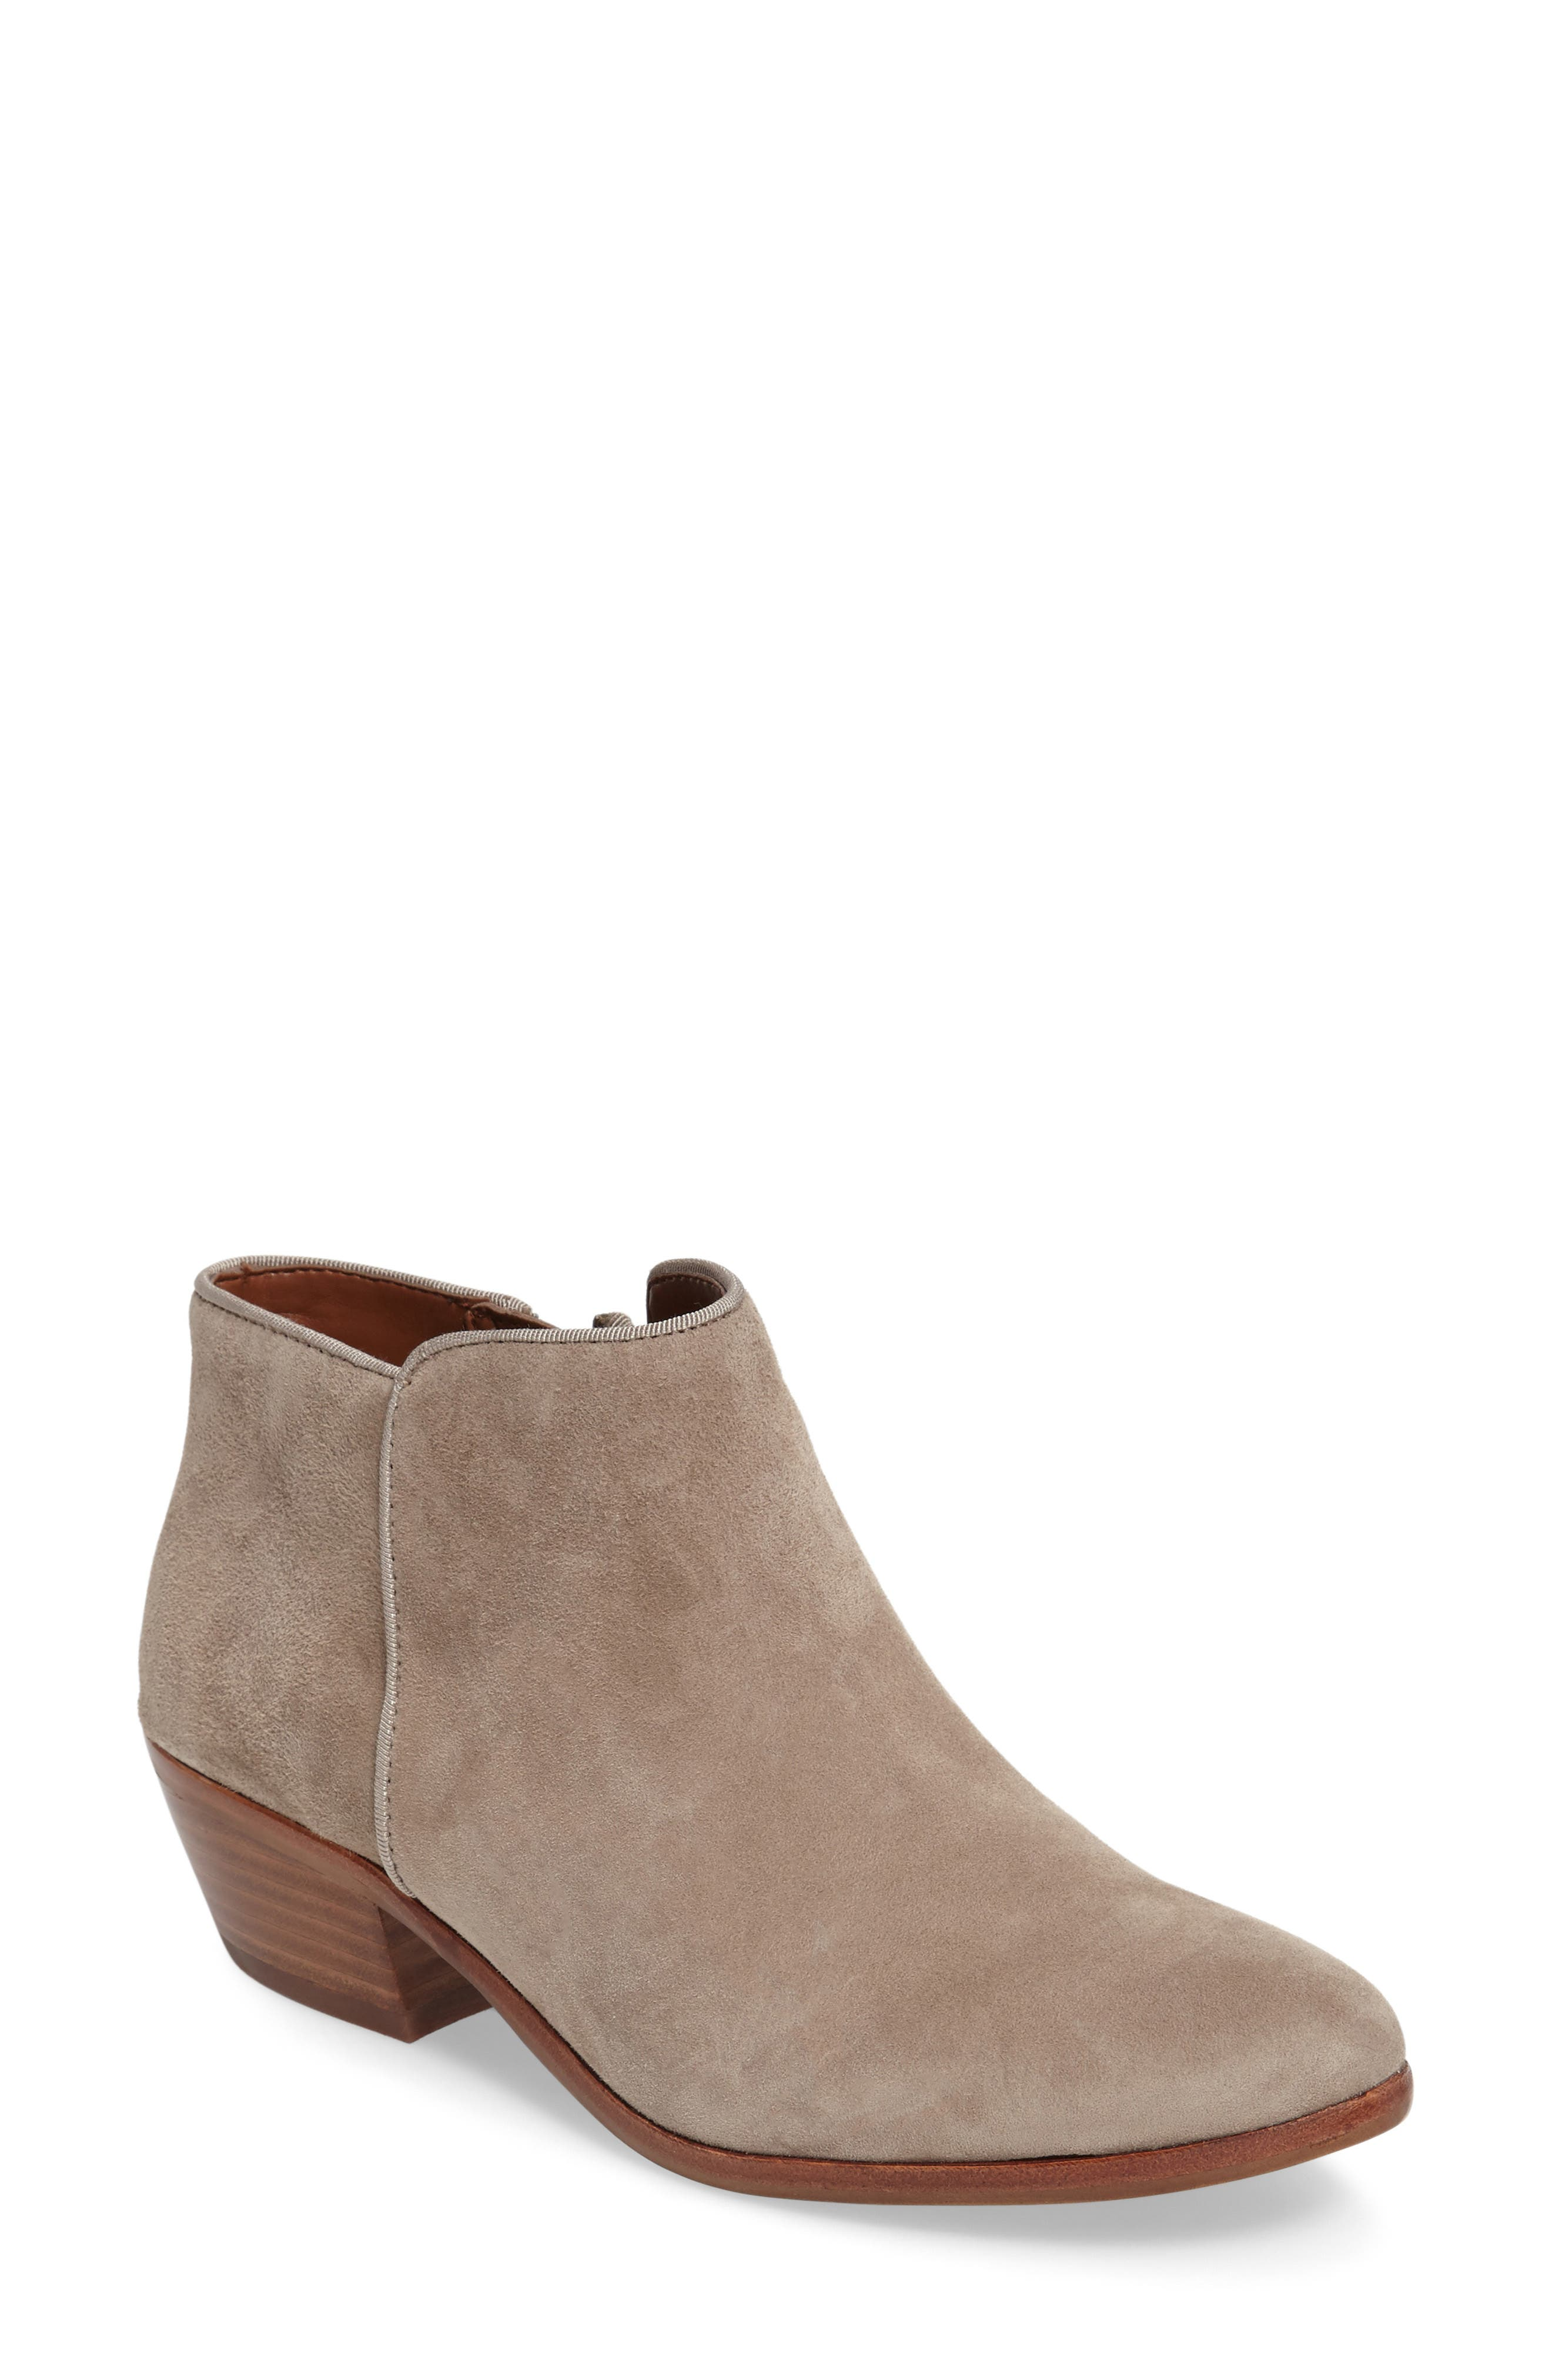 2b51de24912ae4 Sam Edelman Women s Boots